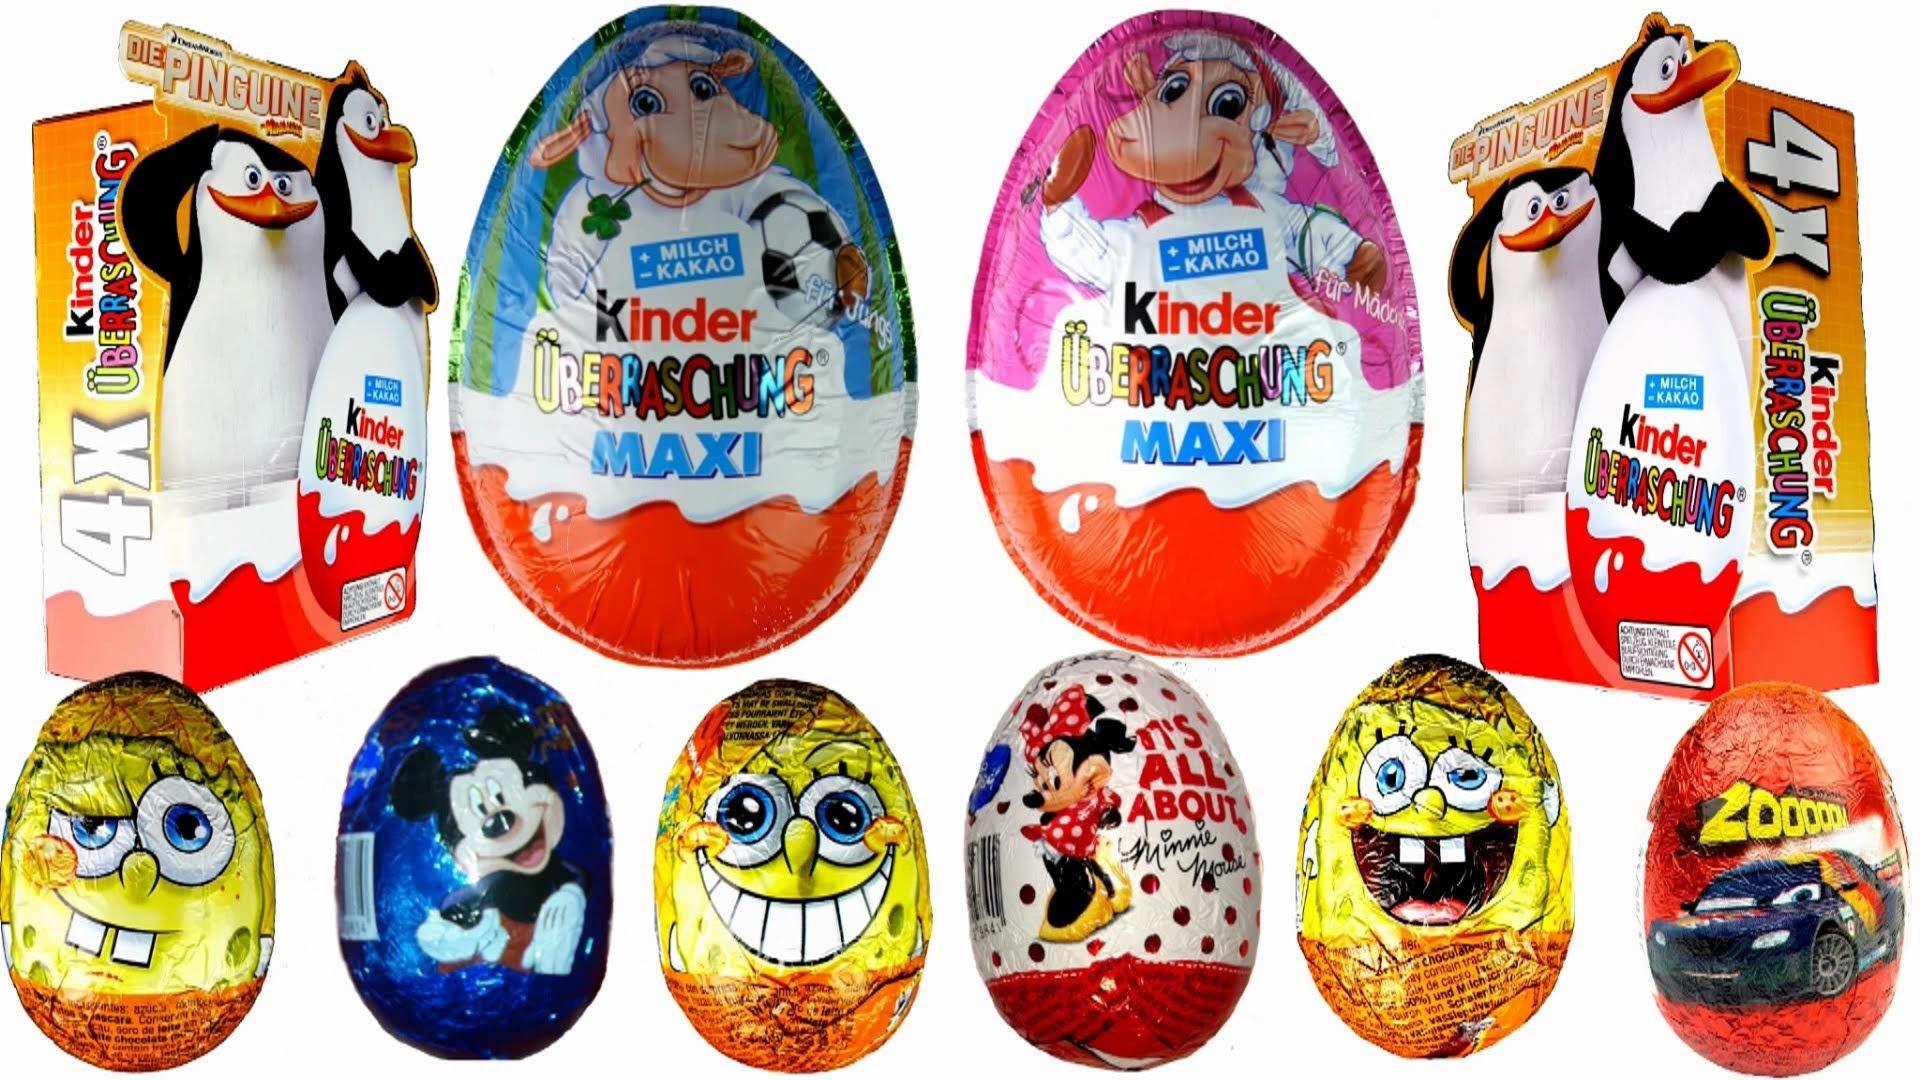 Kinder joy toys car   Surprise eggs Disney Pixar Cars Mickey Mouse Hello Kitty MAXI